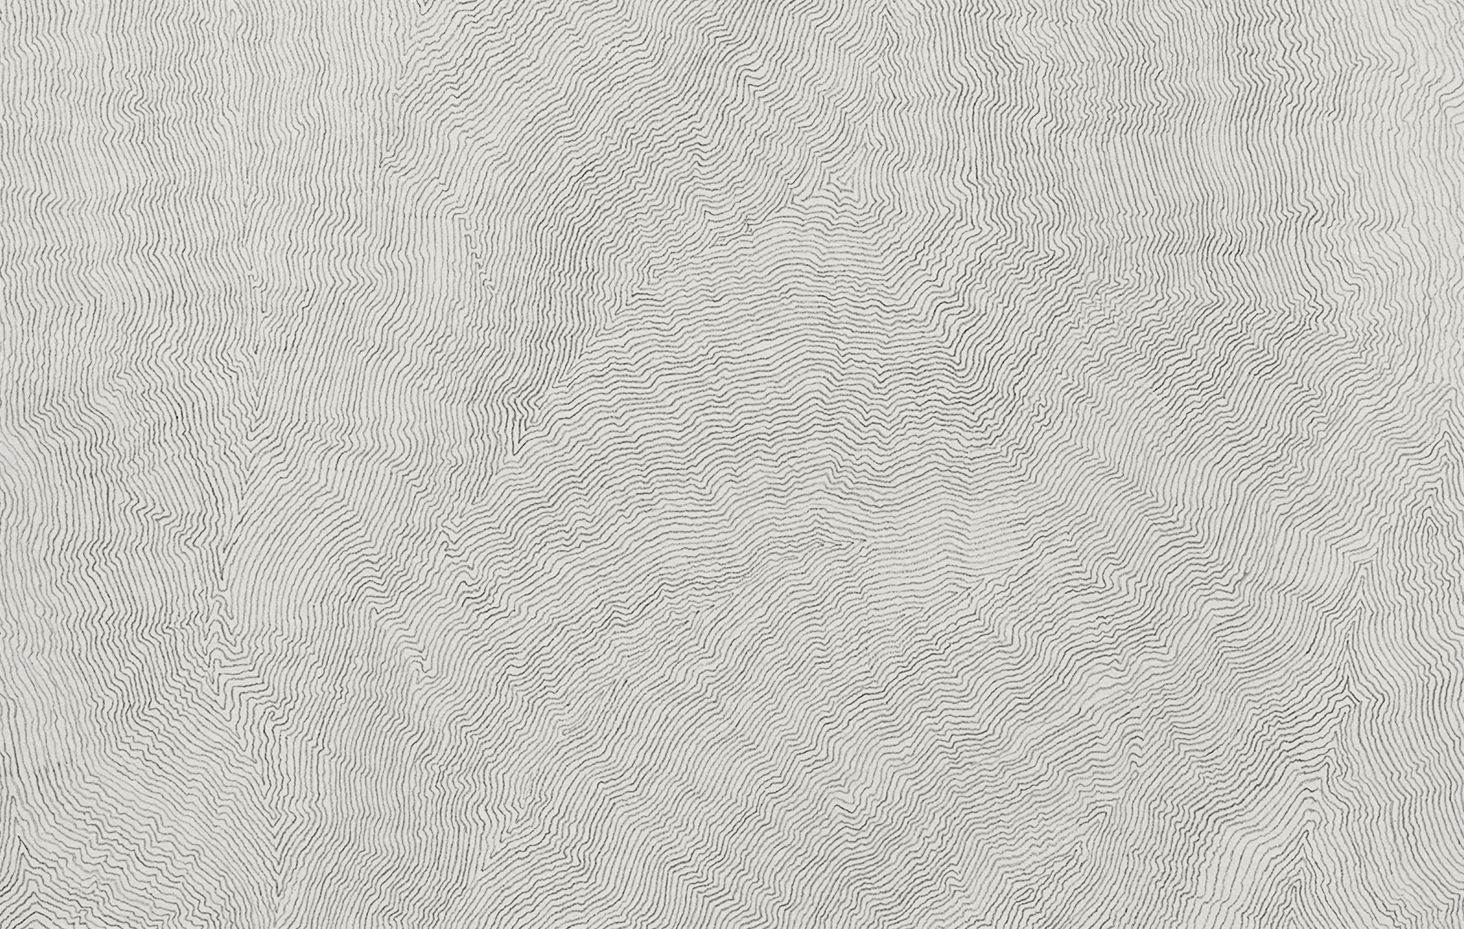 Detail of Linear Scenery, 2004-05